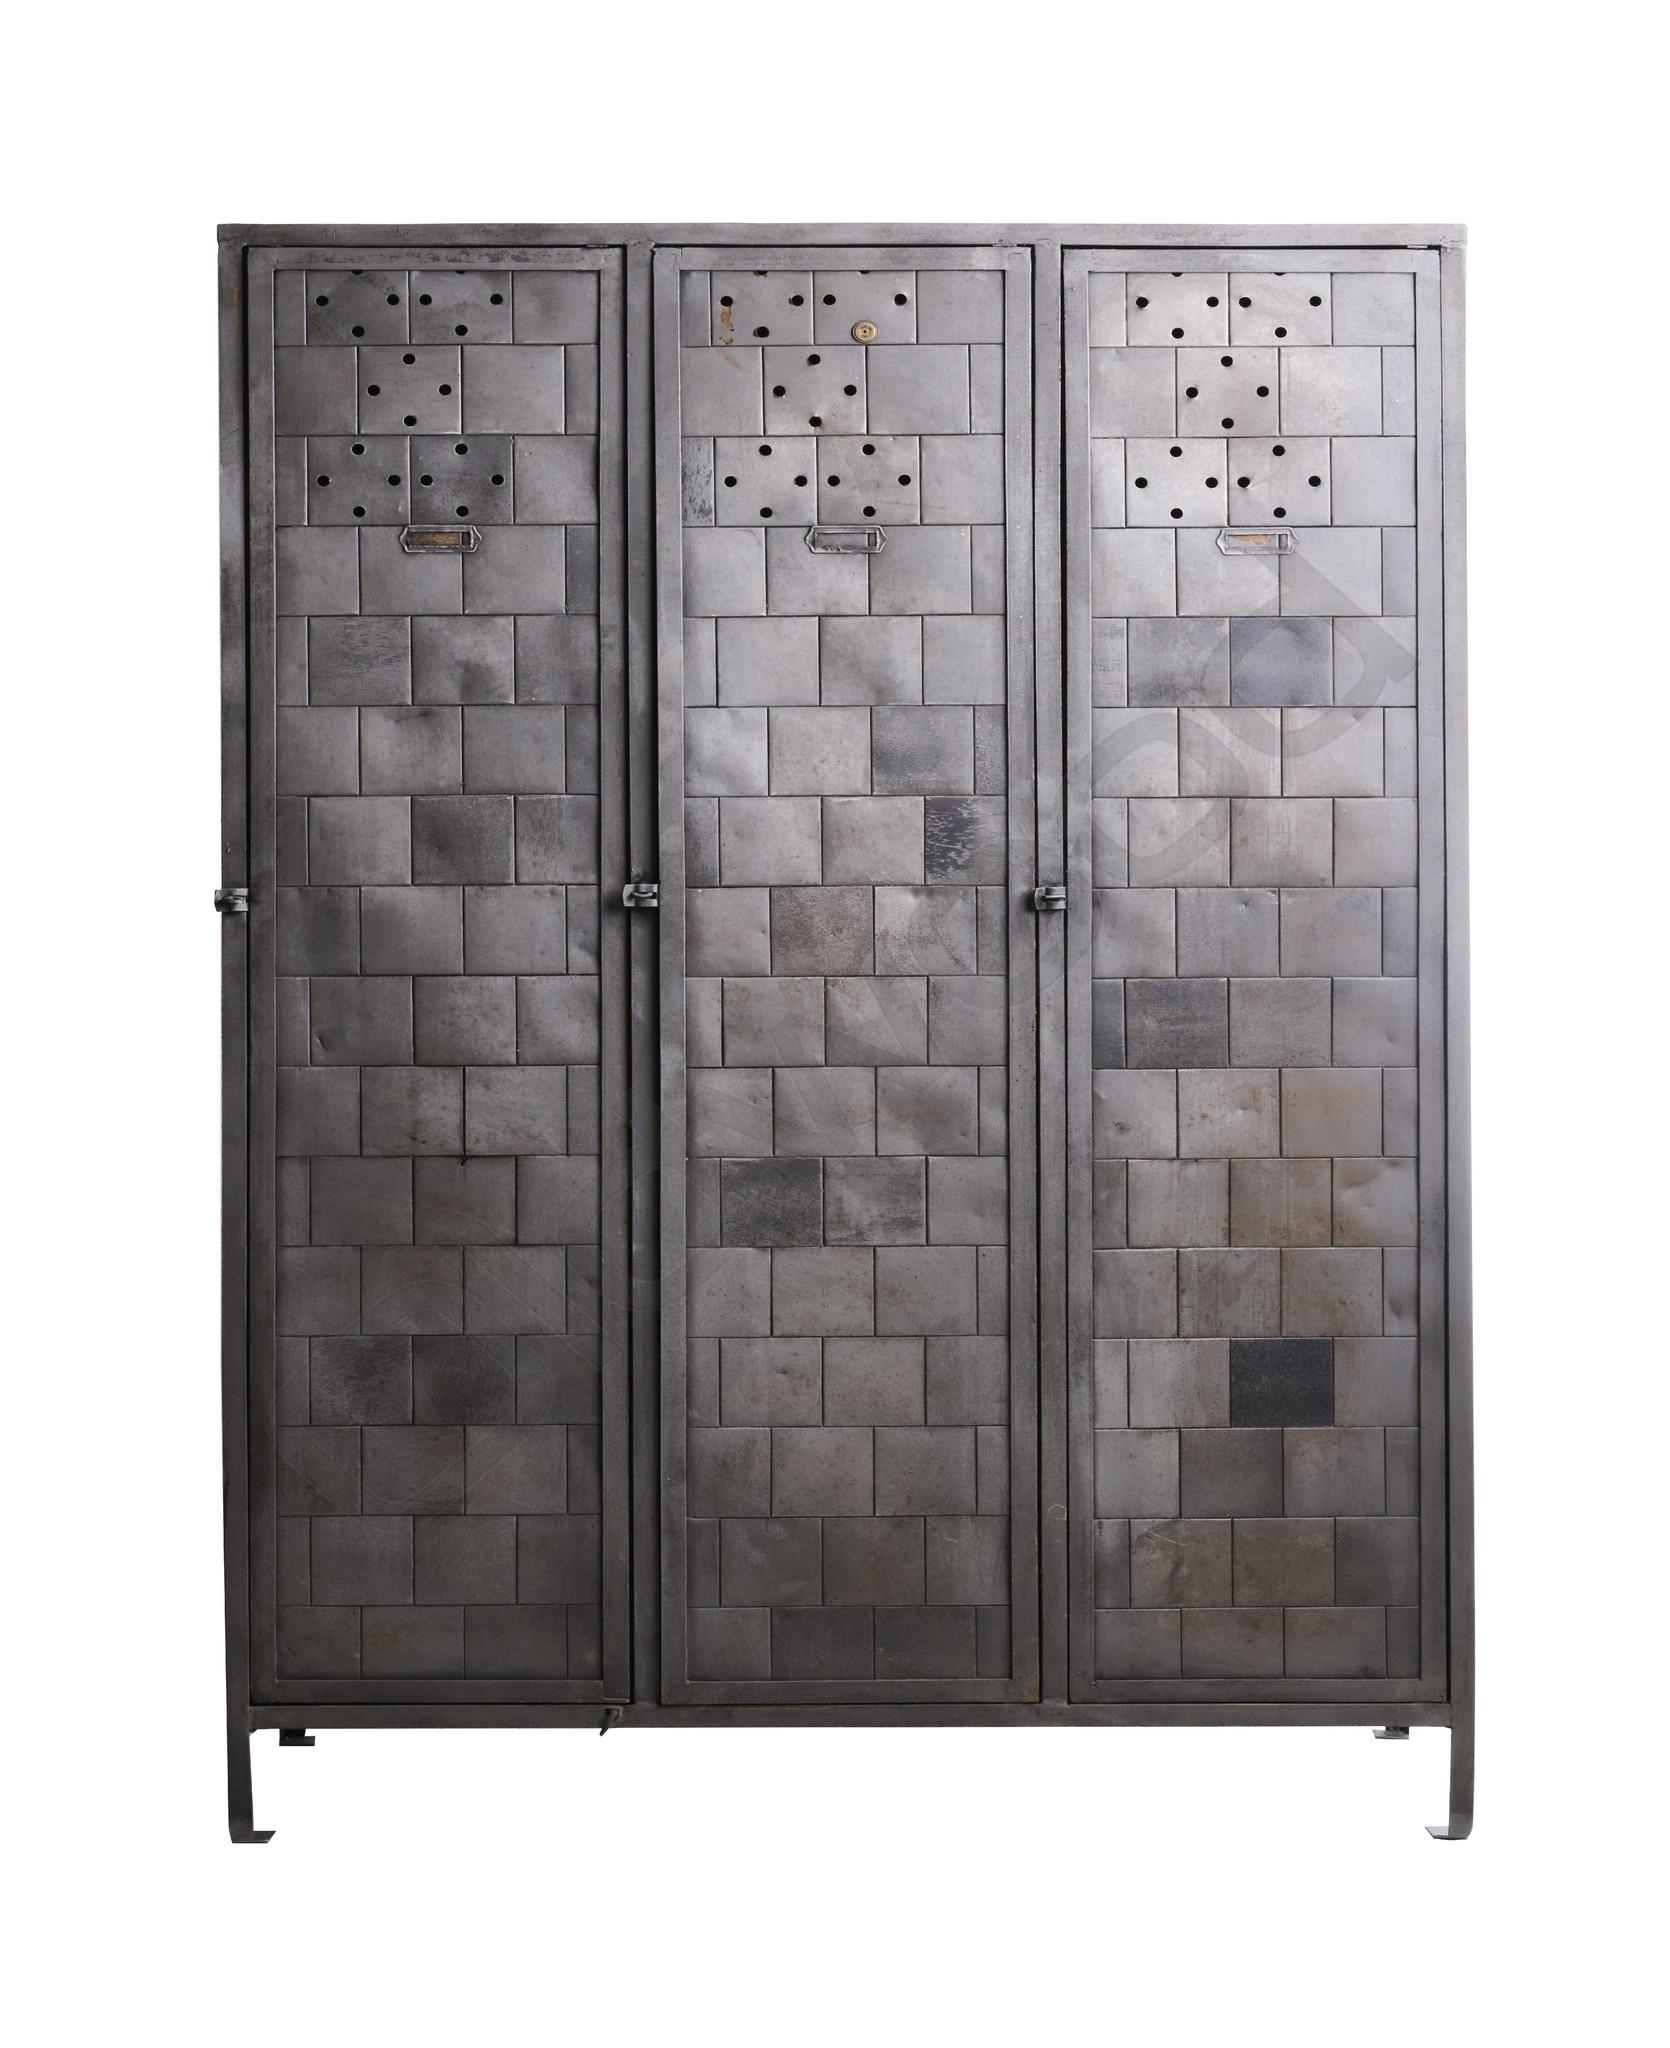 (Gereserveerd) Grote metalen locker met uniek patroon